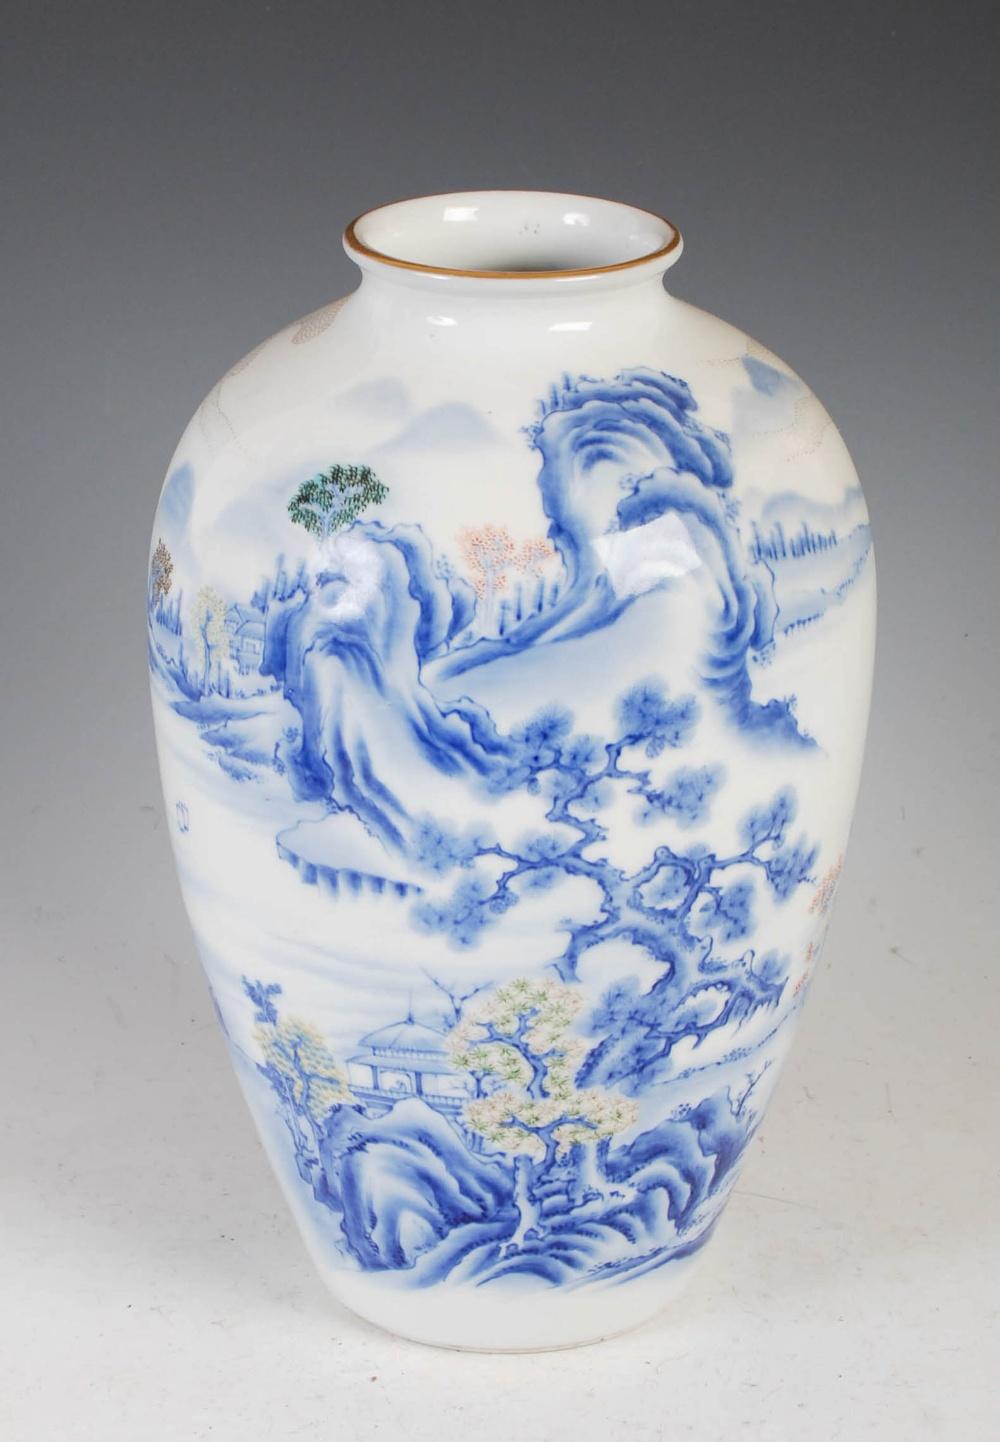 A Japanese Fukagawa porcelain vase, late Meiji/ Taisho Period, decorated with pavilion on a